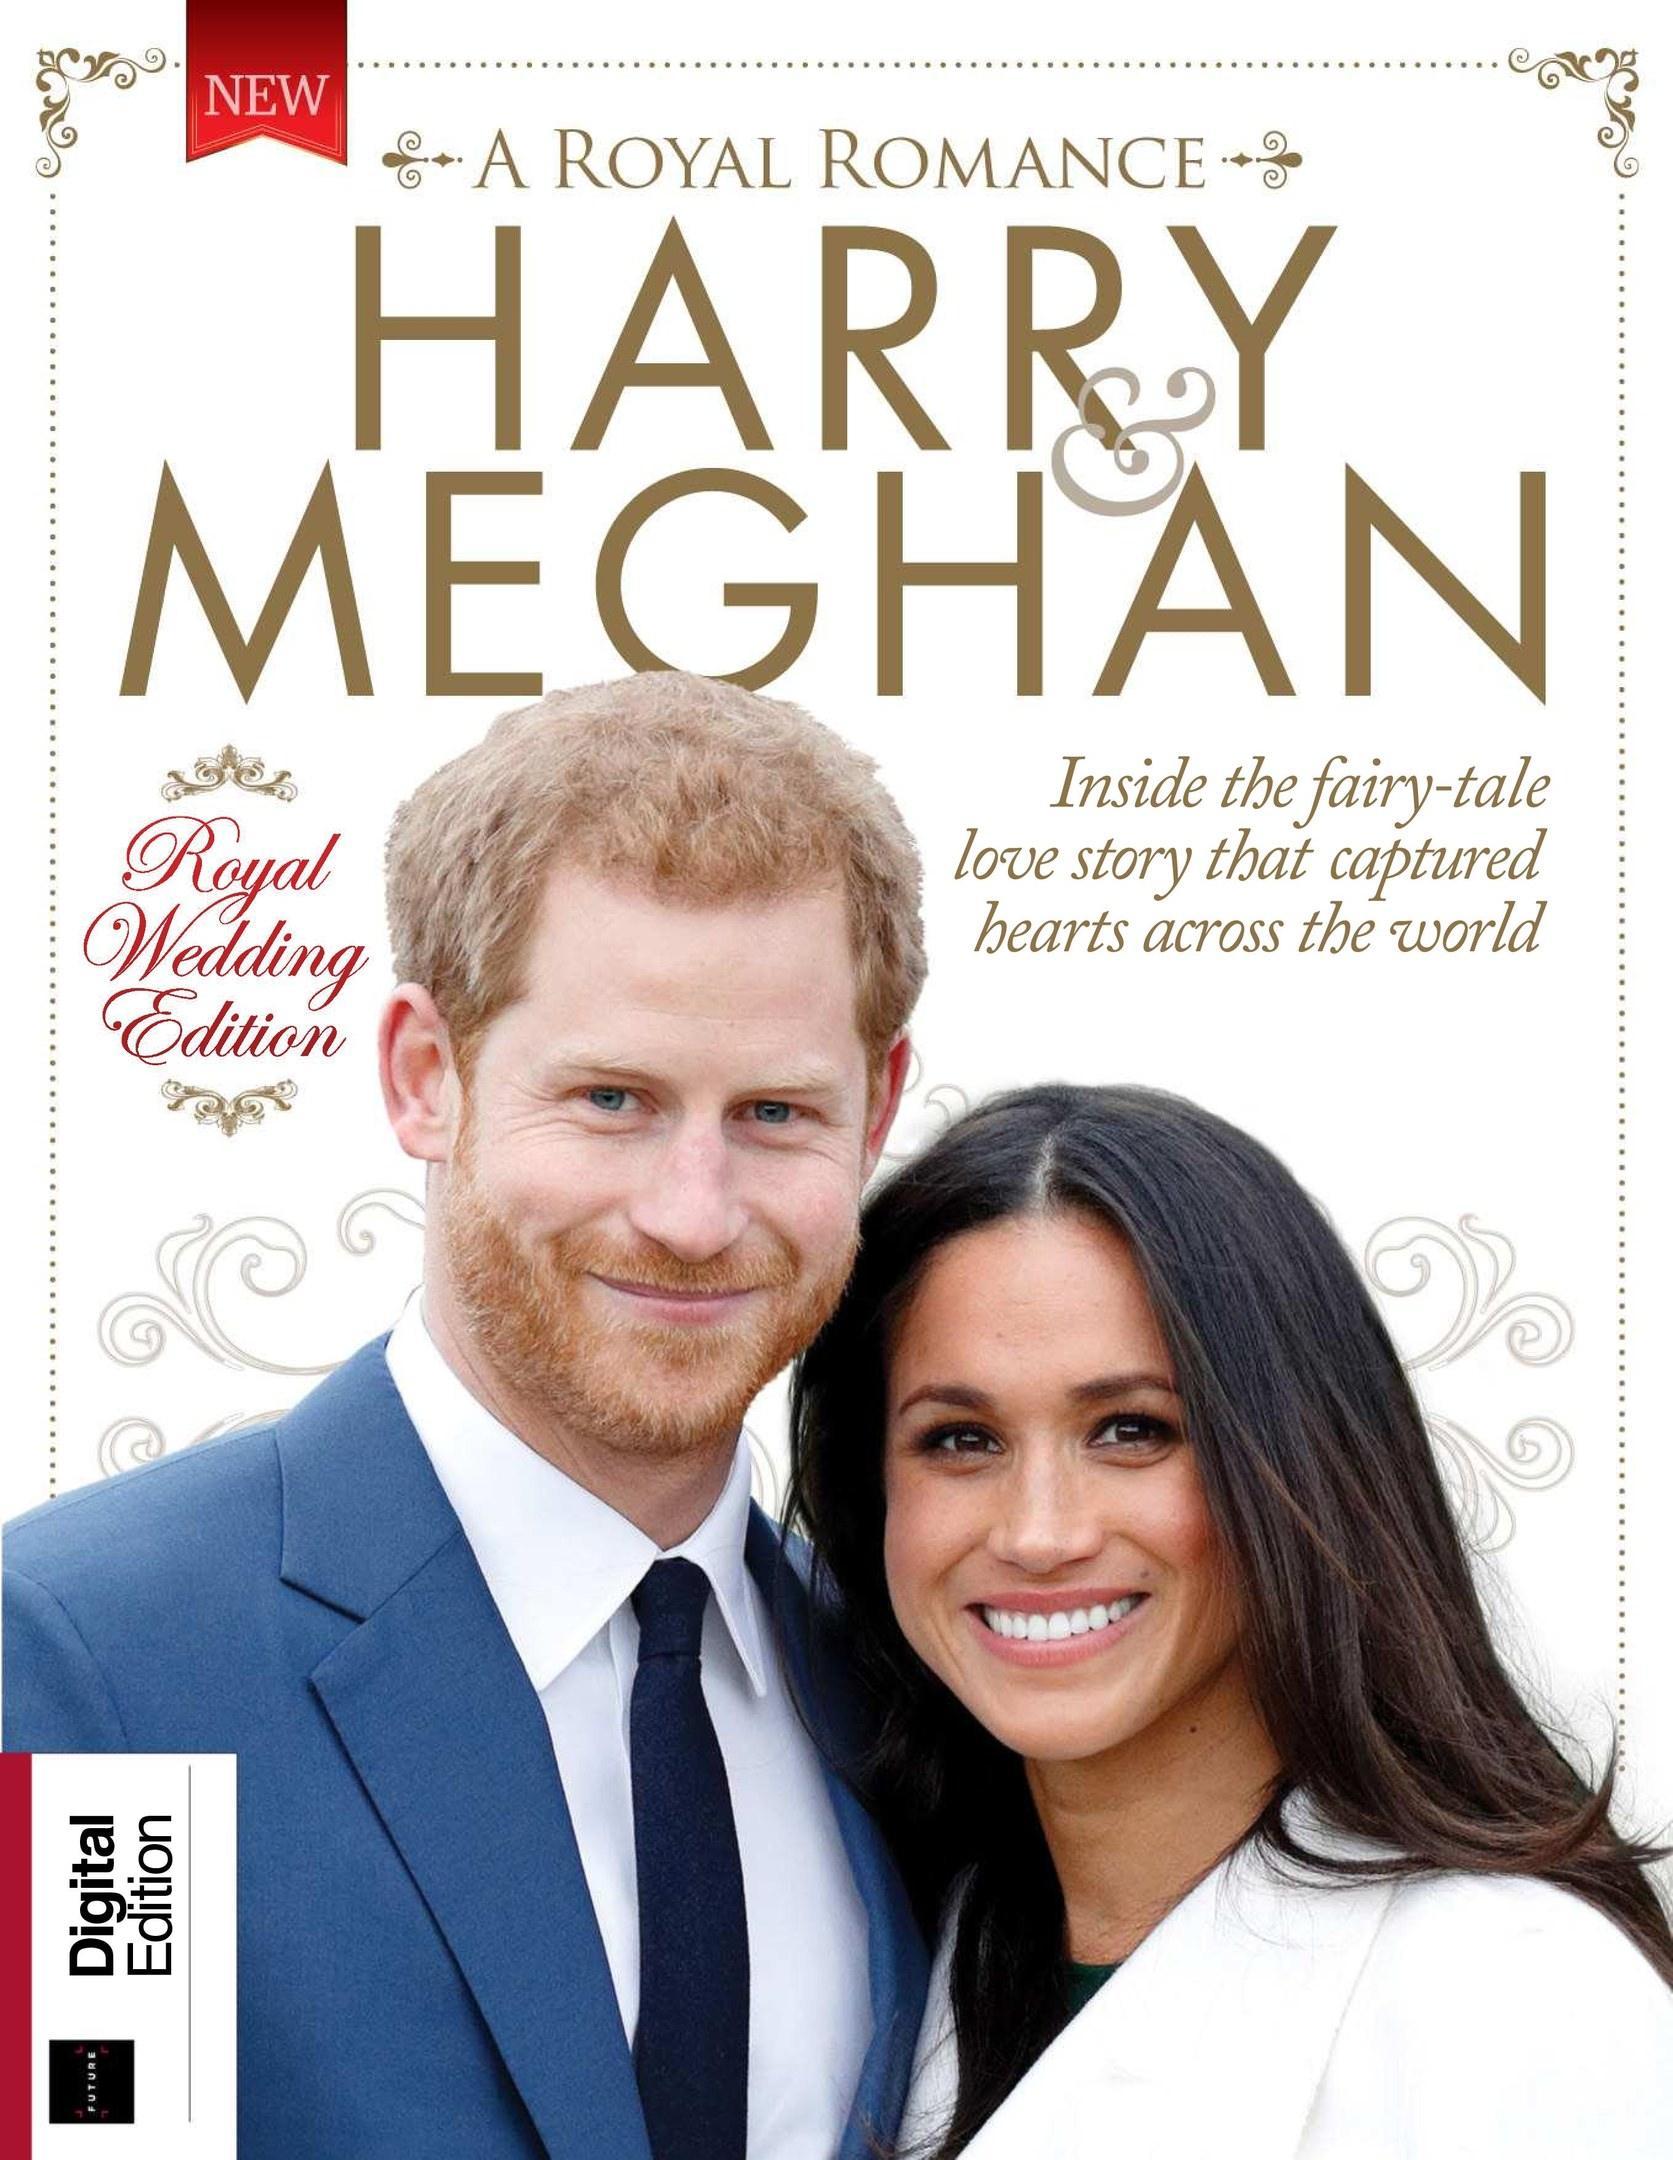 Wedding bride magazines 2017 pdf download free harry meghan a royal romance april 2018 fandeluxe Images